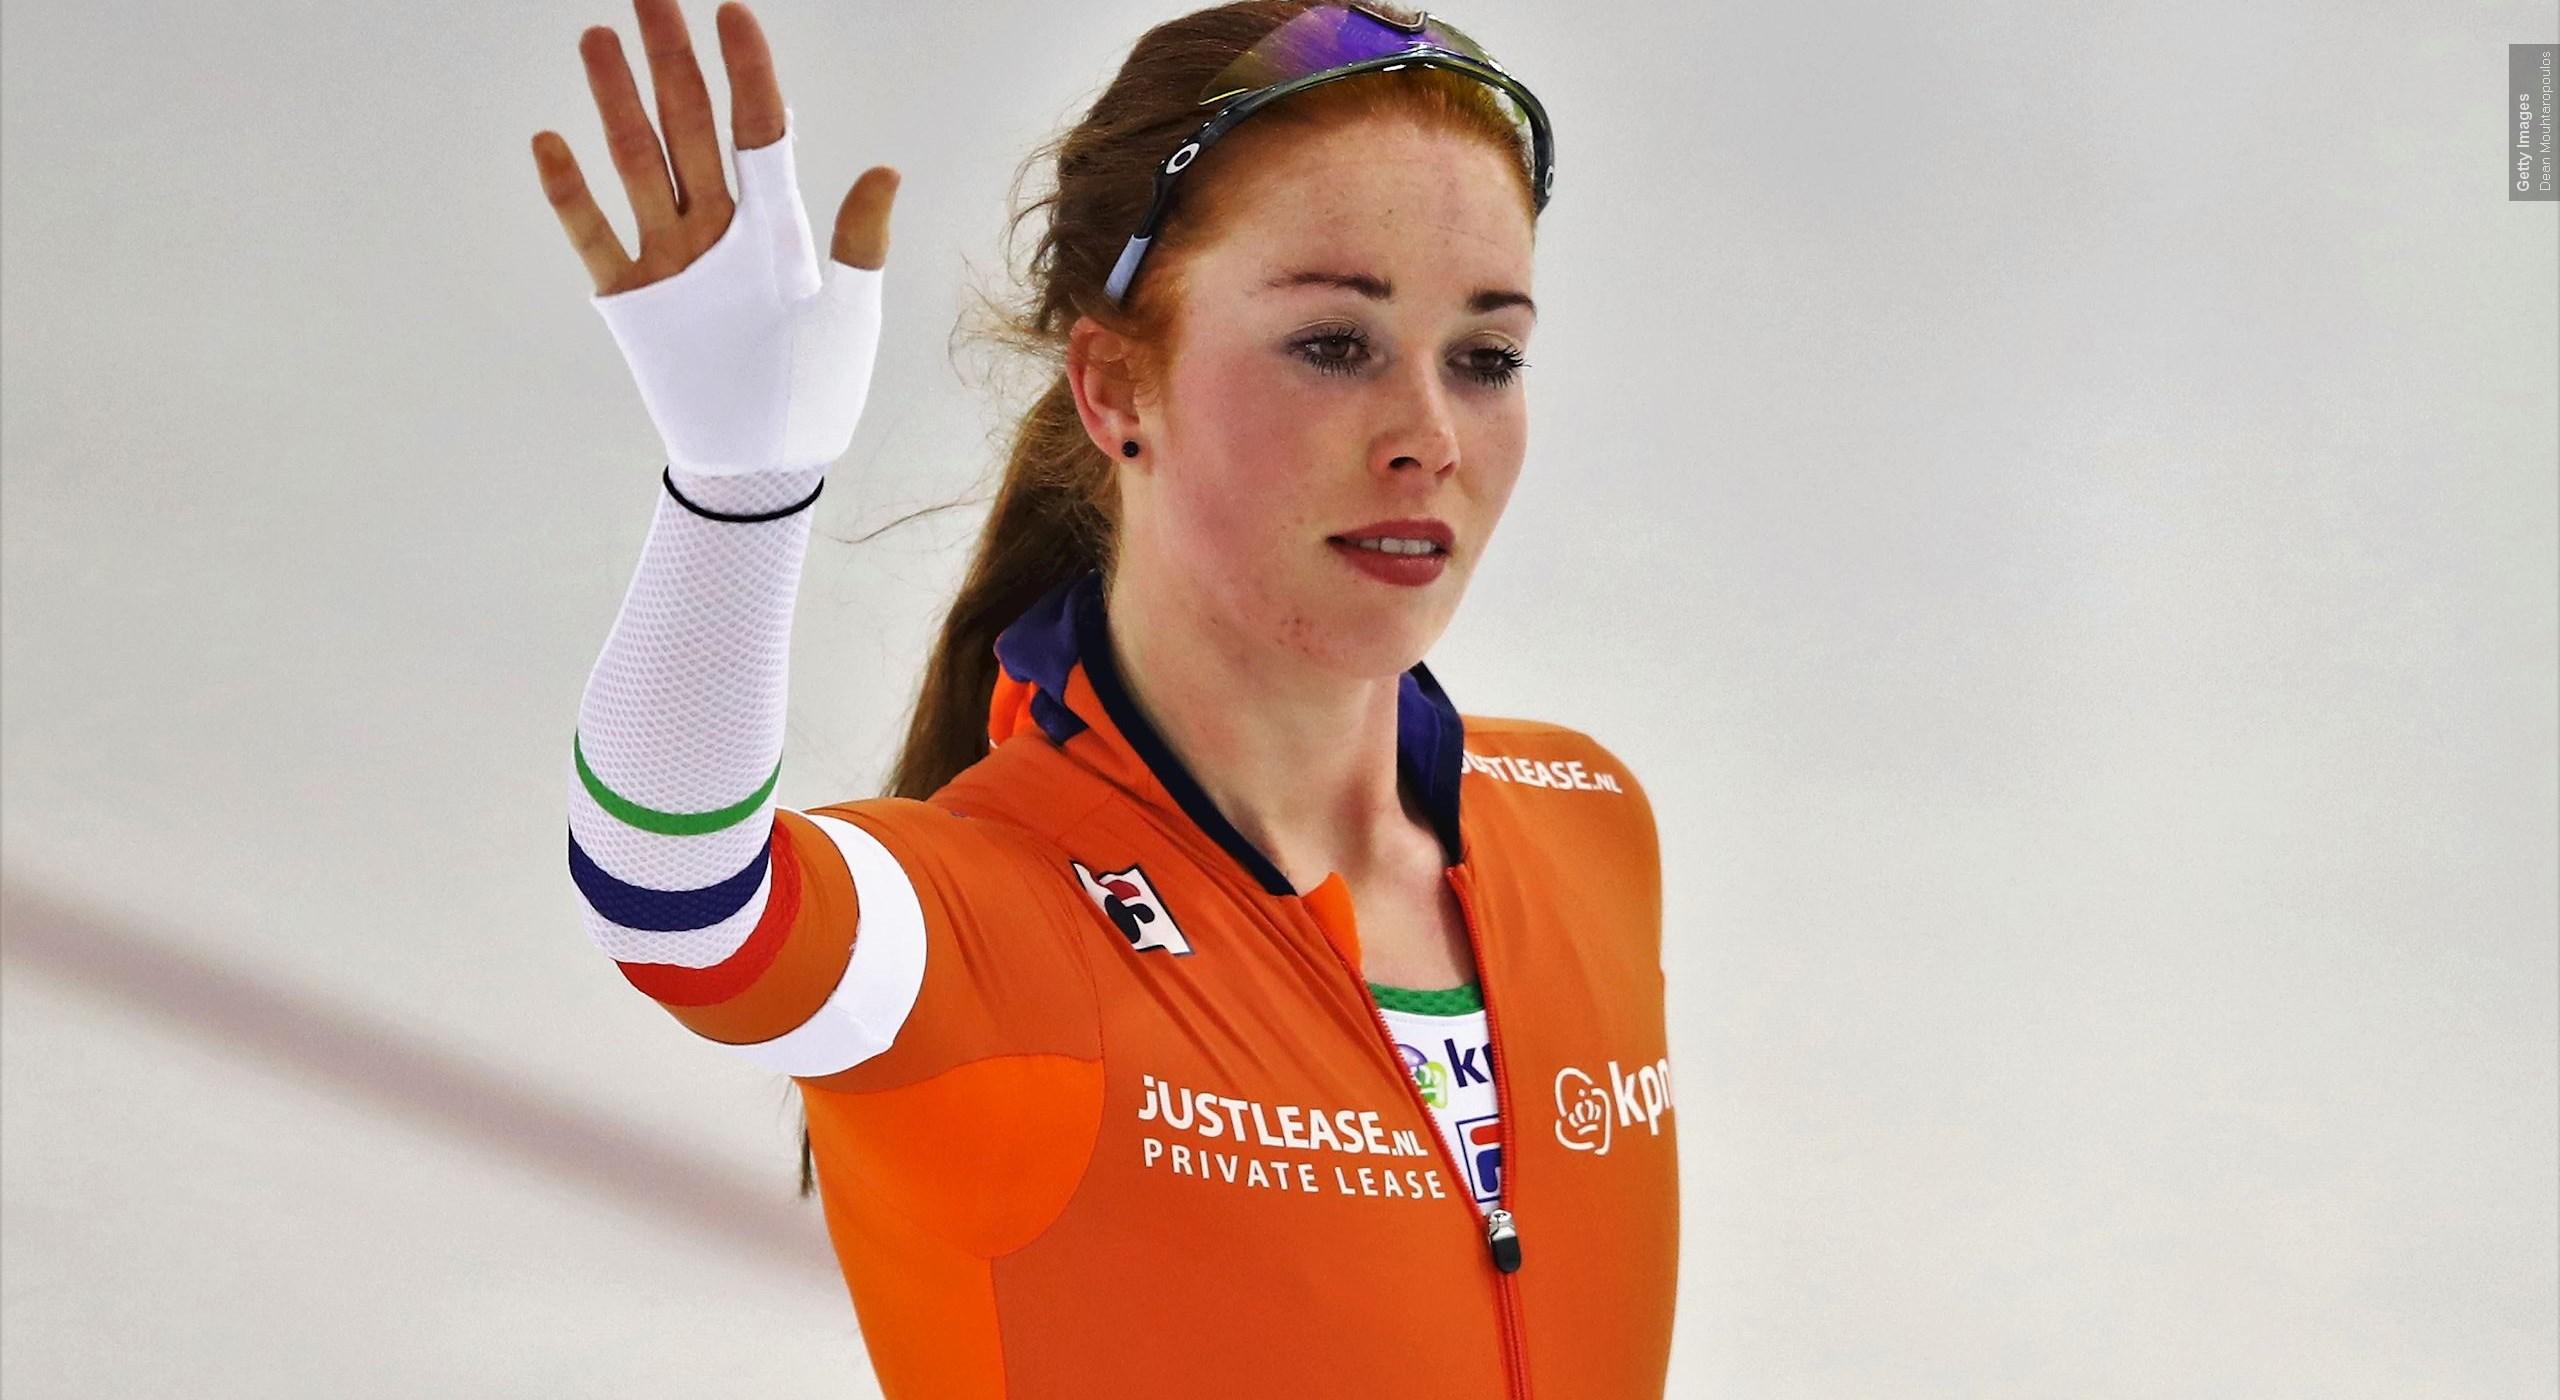 Antoinette de Jong